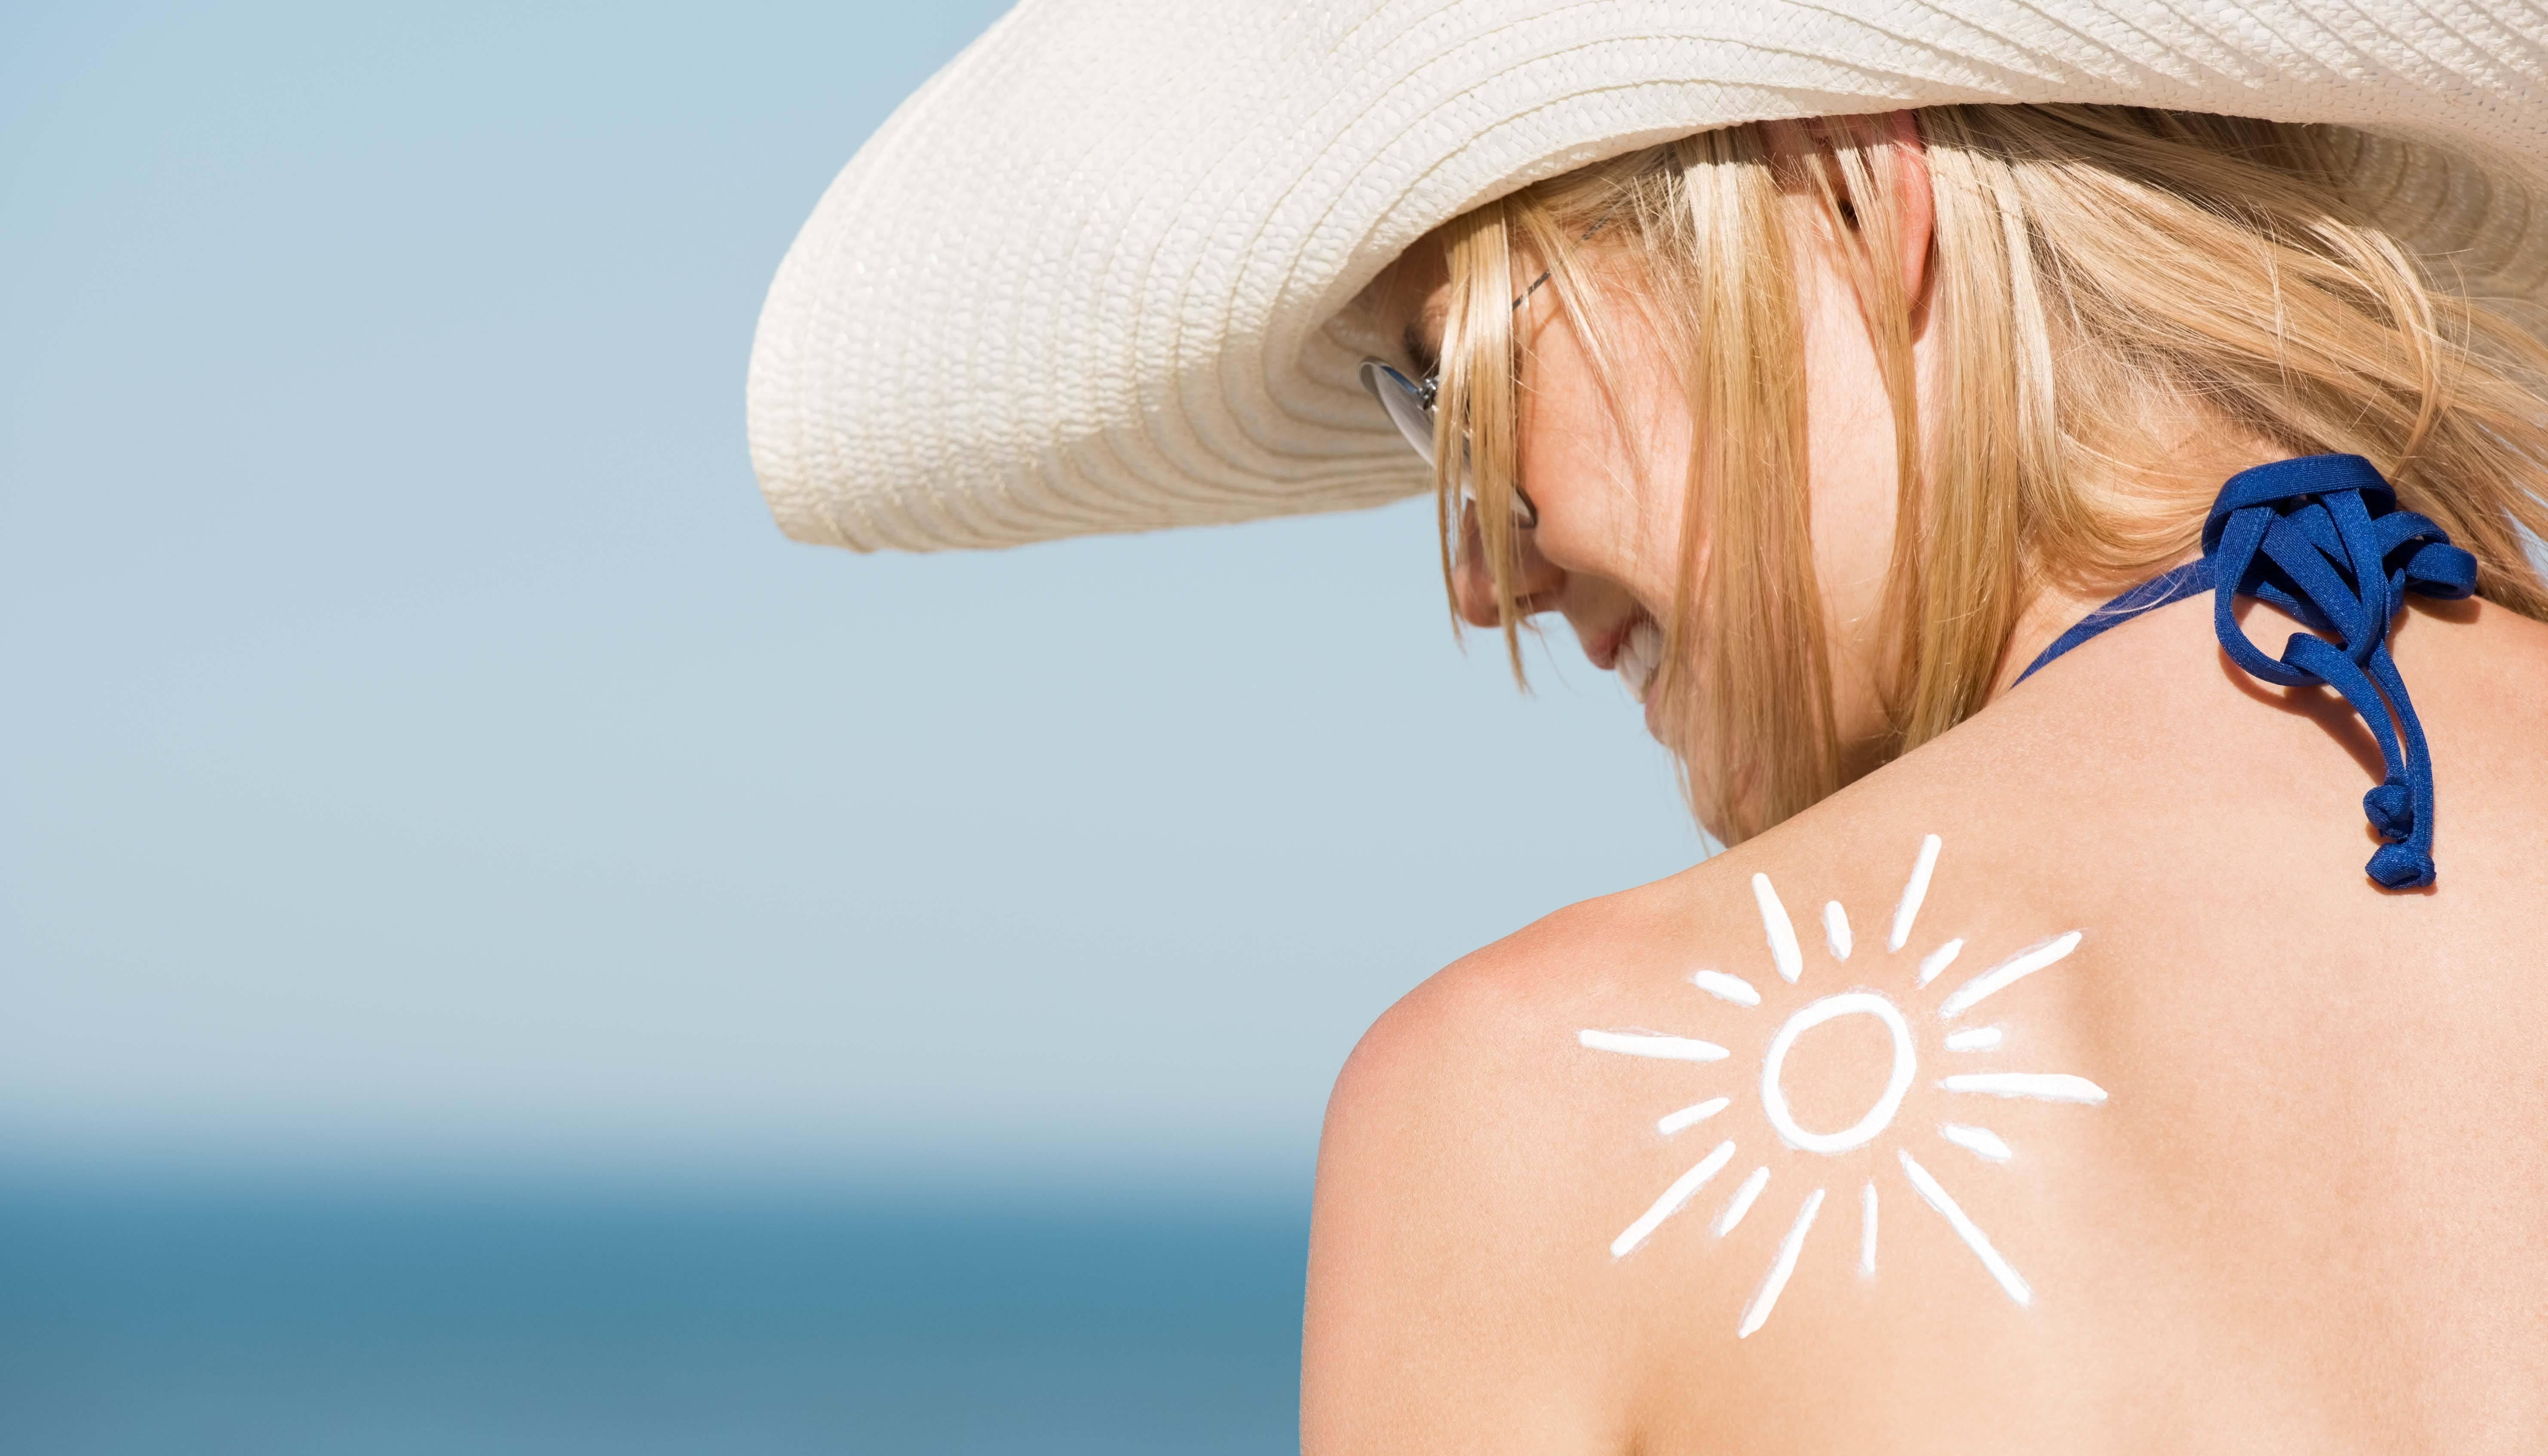 Sunscreen Season